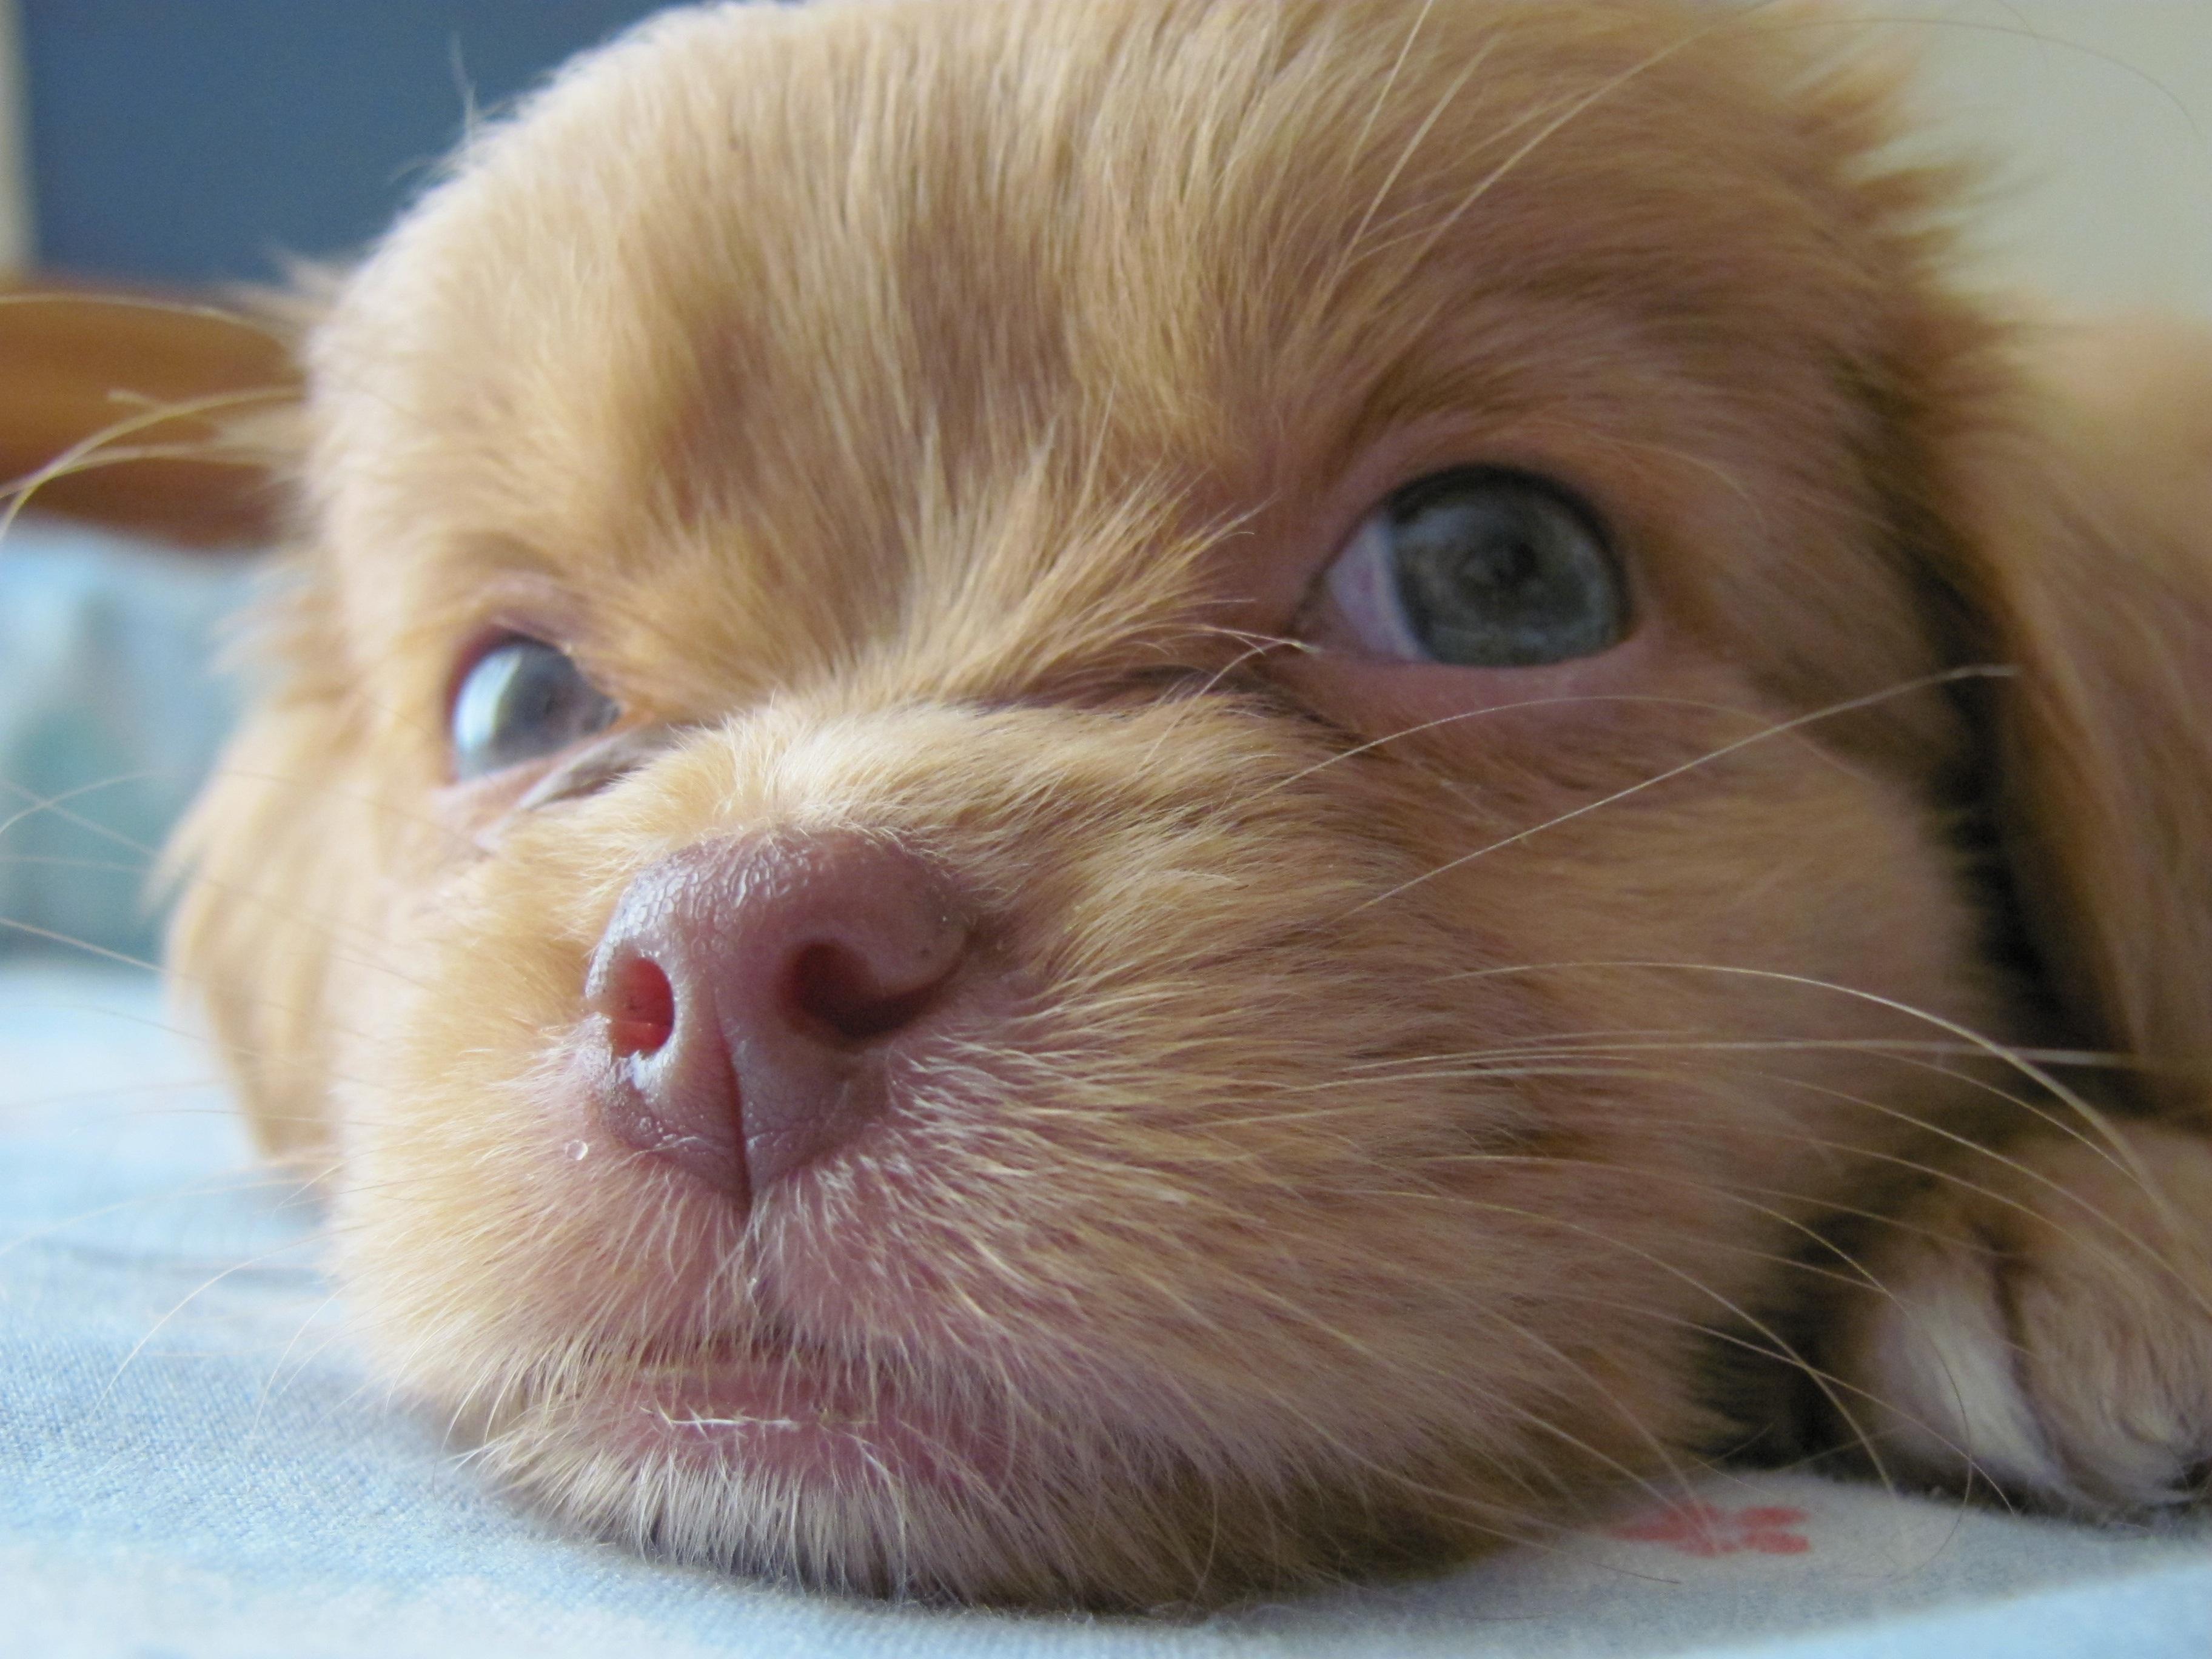 Fantastic Charles Spaniel Brown Adorable Dog - puppy-dog-animal-cute-pet-mammal-friend-spaniel-nose-vertebrate-dog-breed-lhasa-apso-cavalier-king-charles-spaniel-bebe-dog-like-mammal-carnivoran-dog-breed-group-dog-crossbreeds-tibetan-spaniel-cavachon-chinese-imperial-dog-642602  Pictures_285662  .jpg